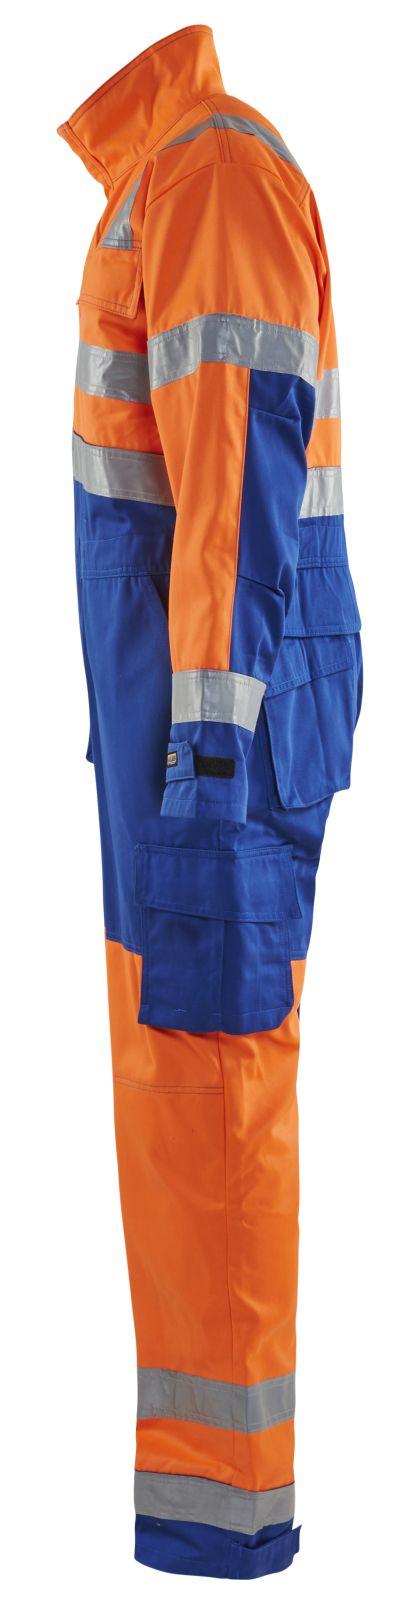 Blaklader Overalls 63731804 High Vis oranje-korenblauw(5385)